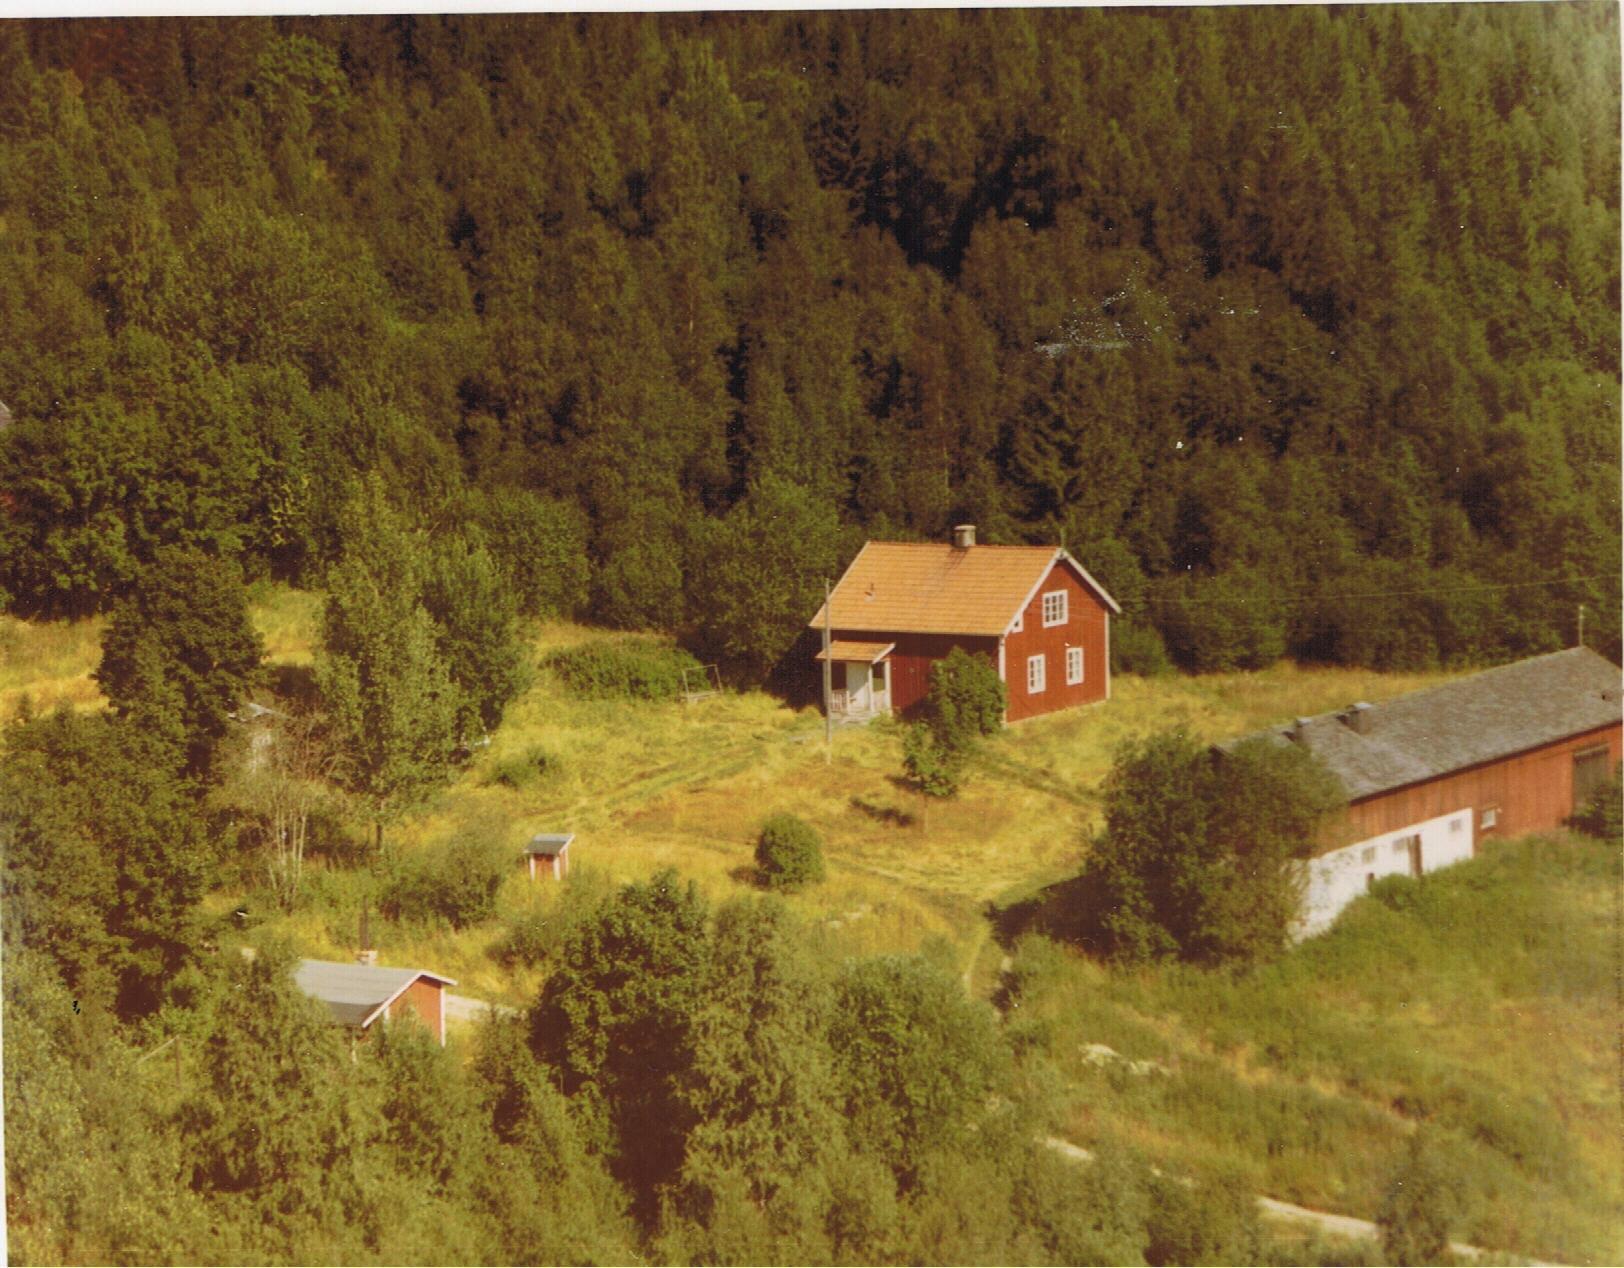 arvid pinni 1978 lena maria andersson 1979 kaellor 1 egen